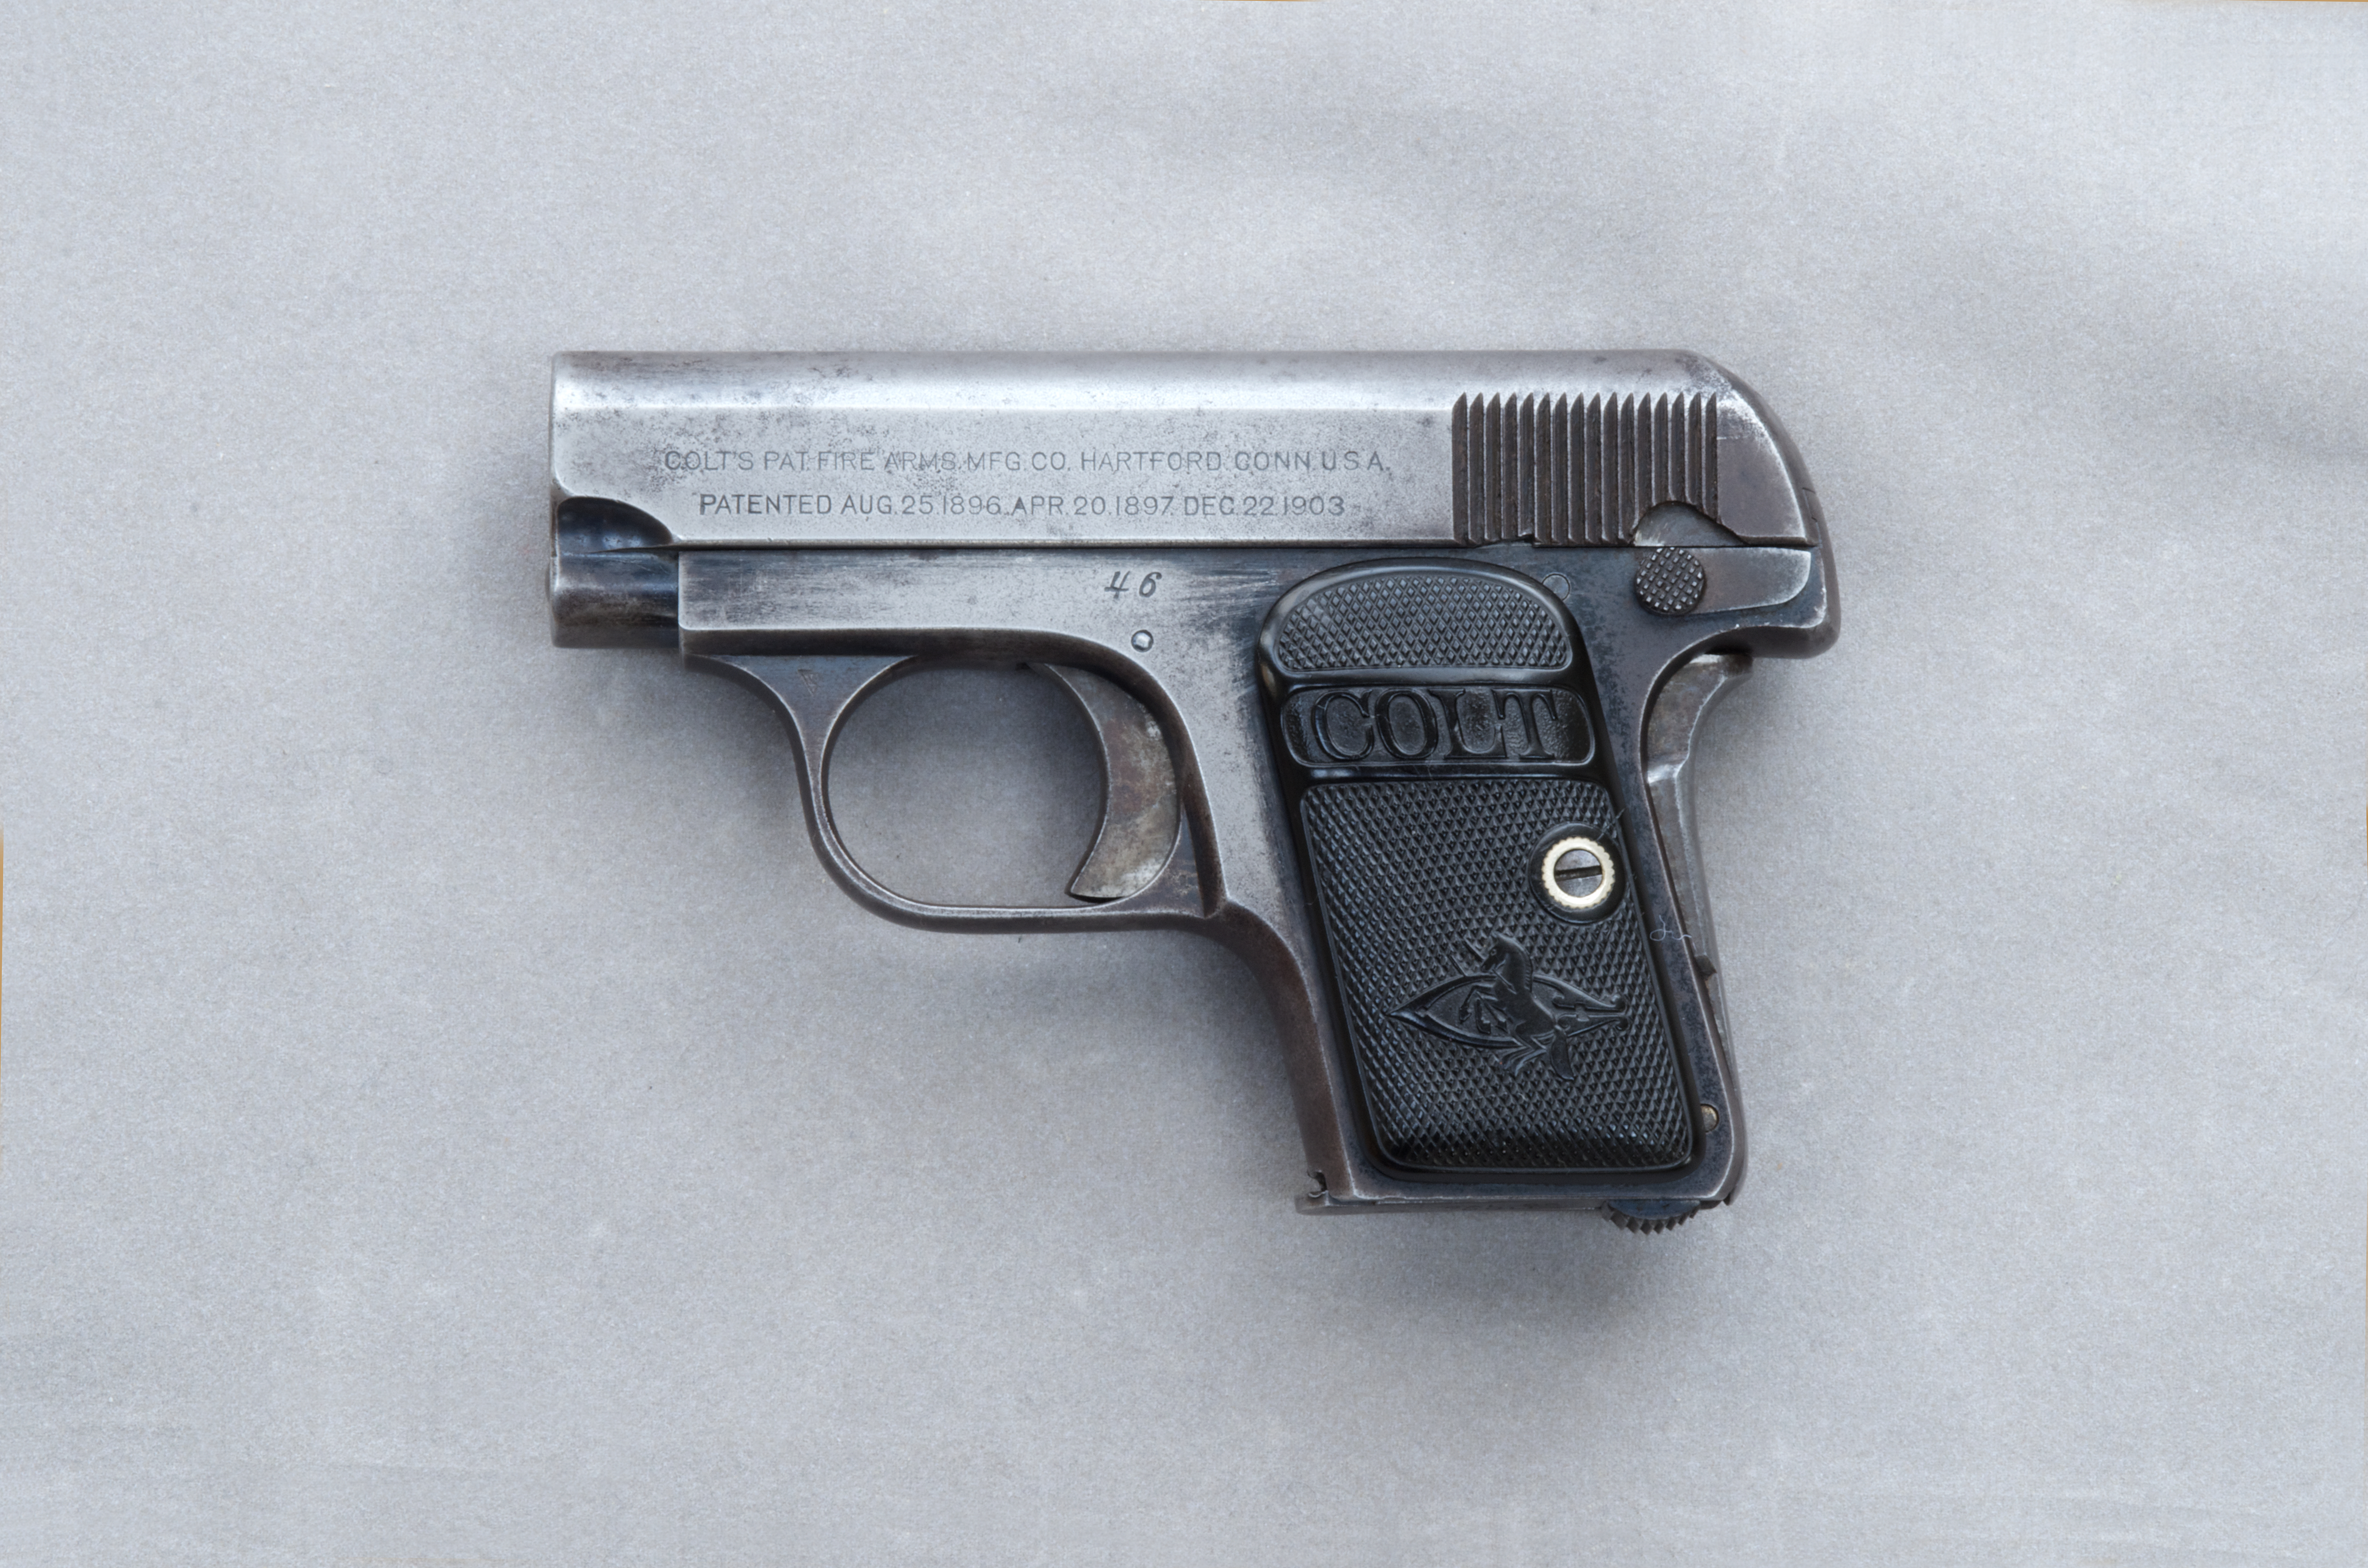 File:Colt 1908 .25 46 L DSC 2685.JPG